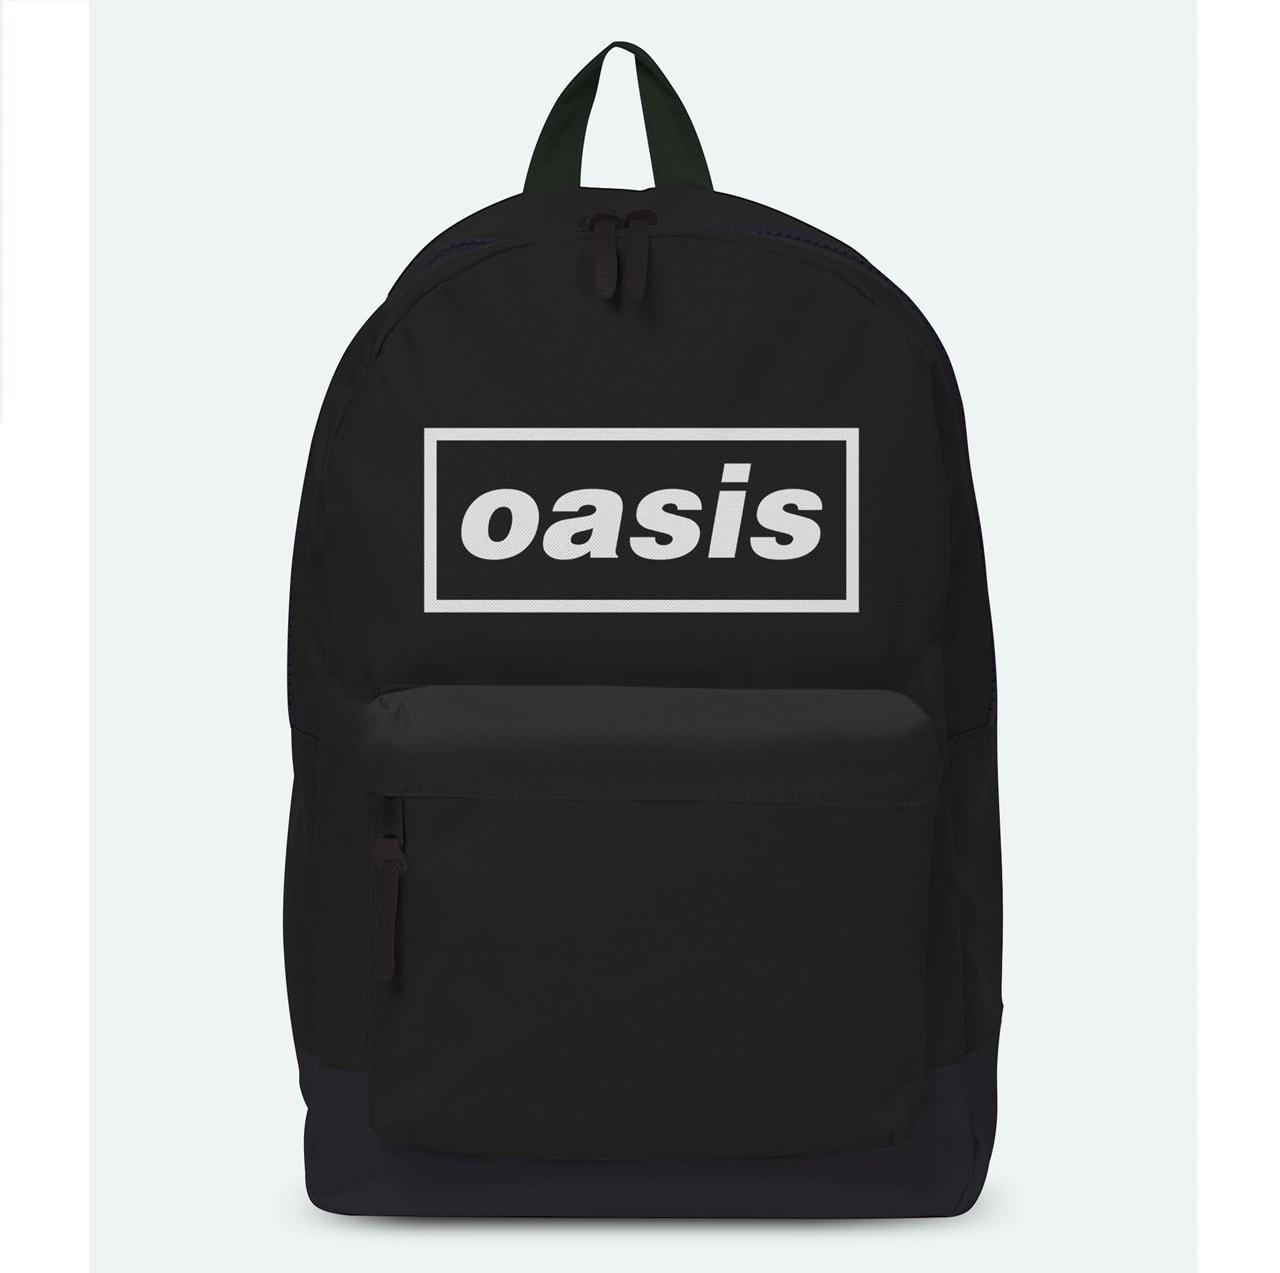 Oasis Black Backpack - 1